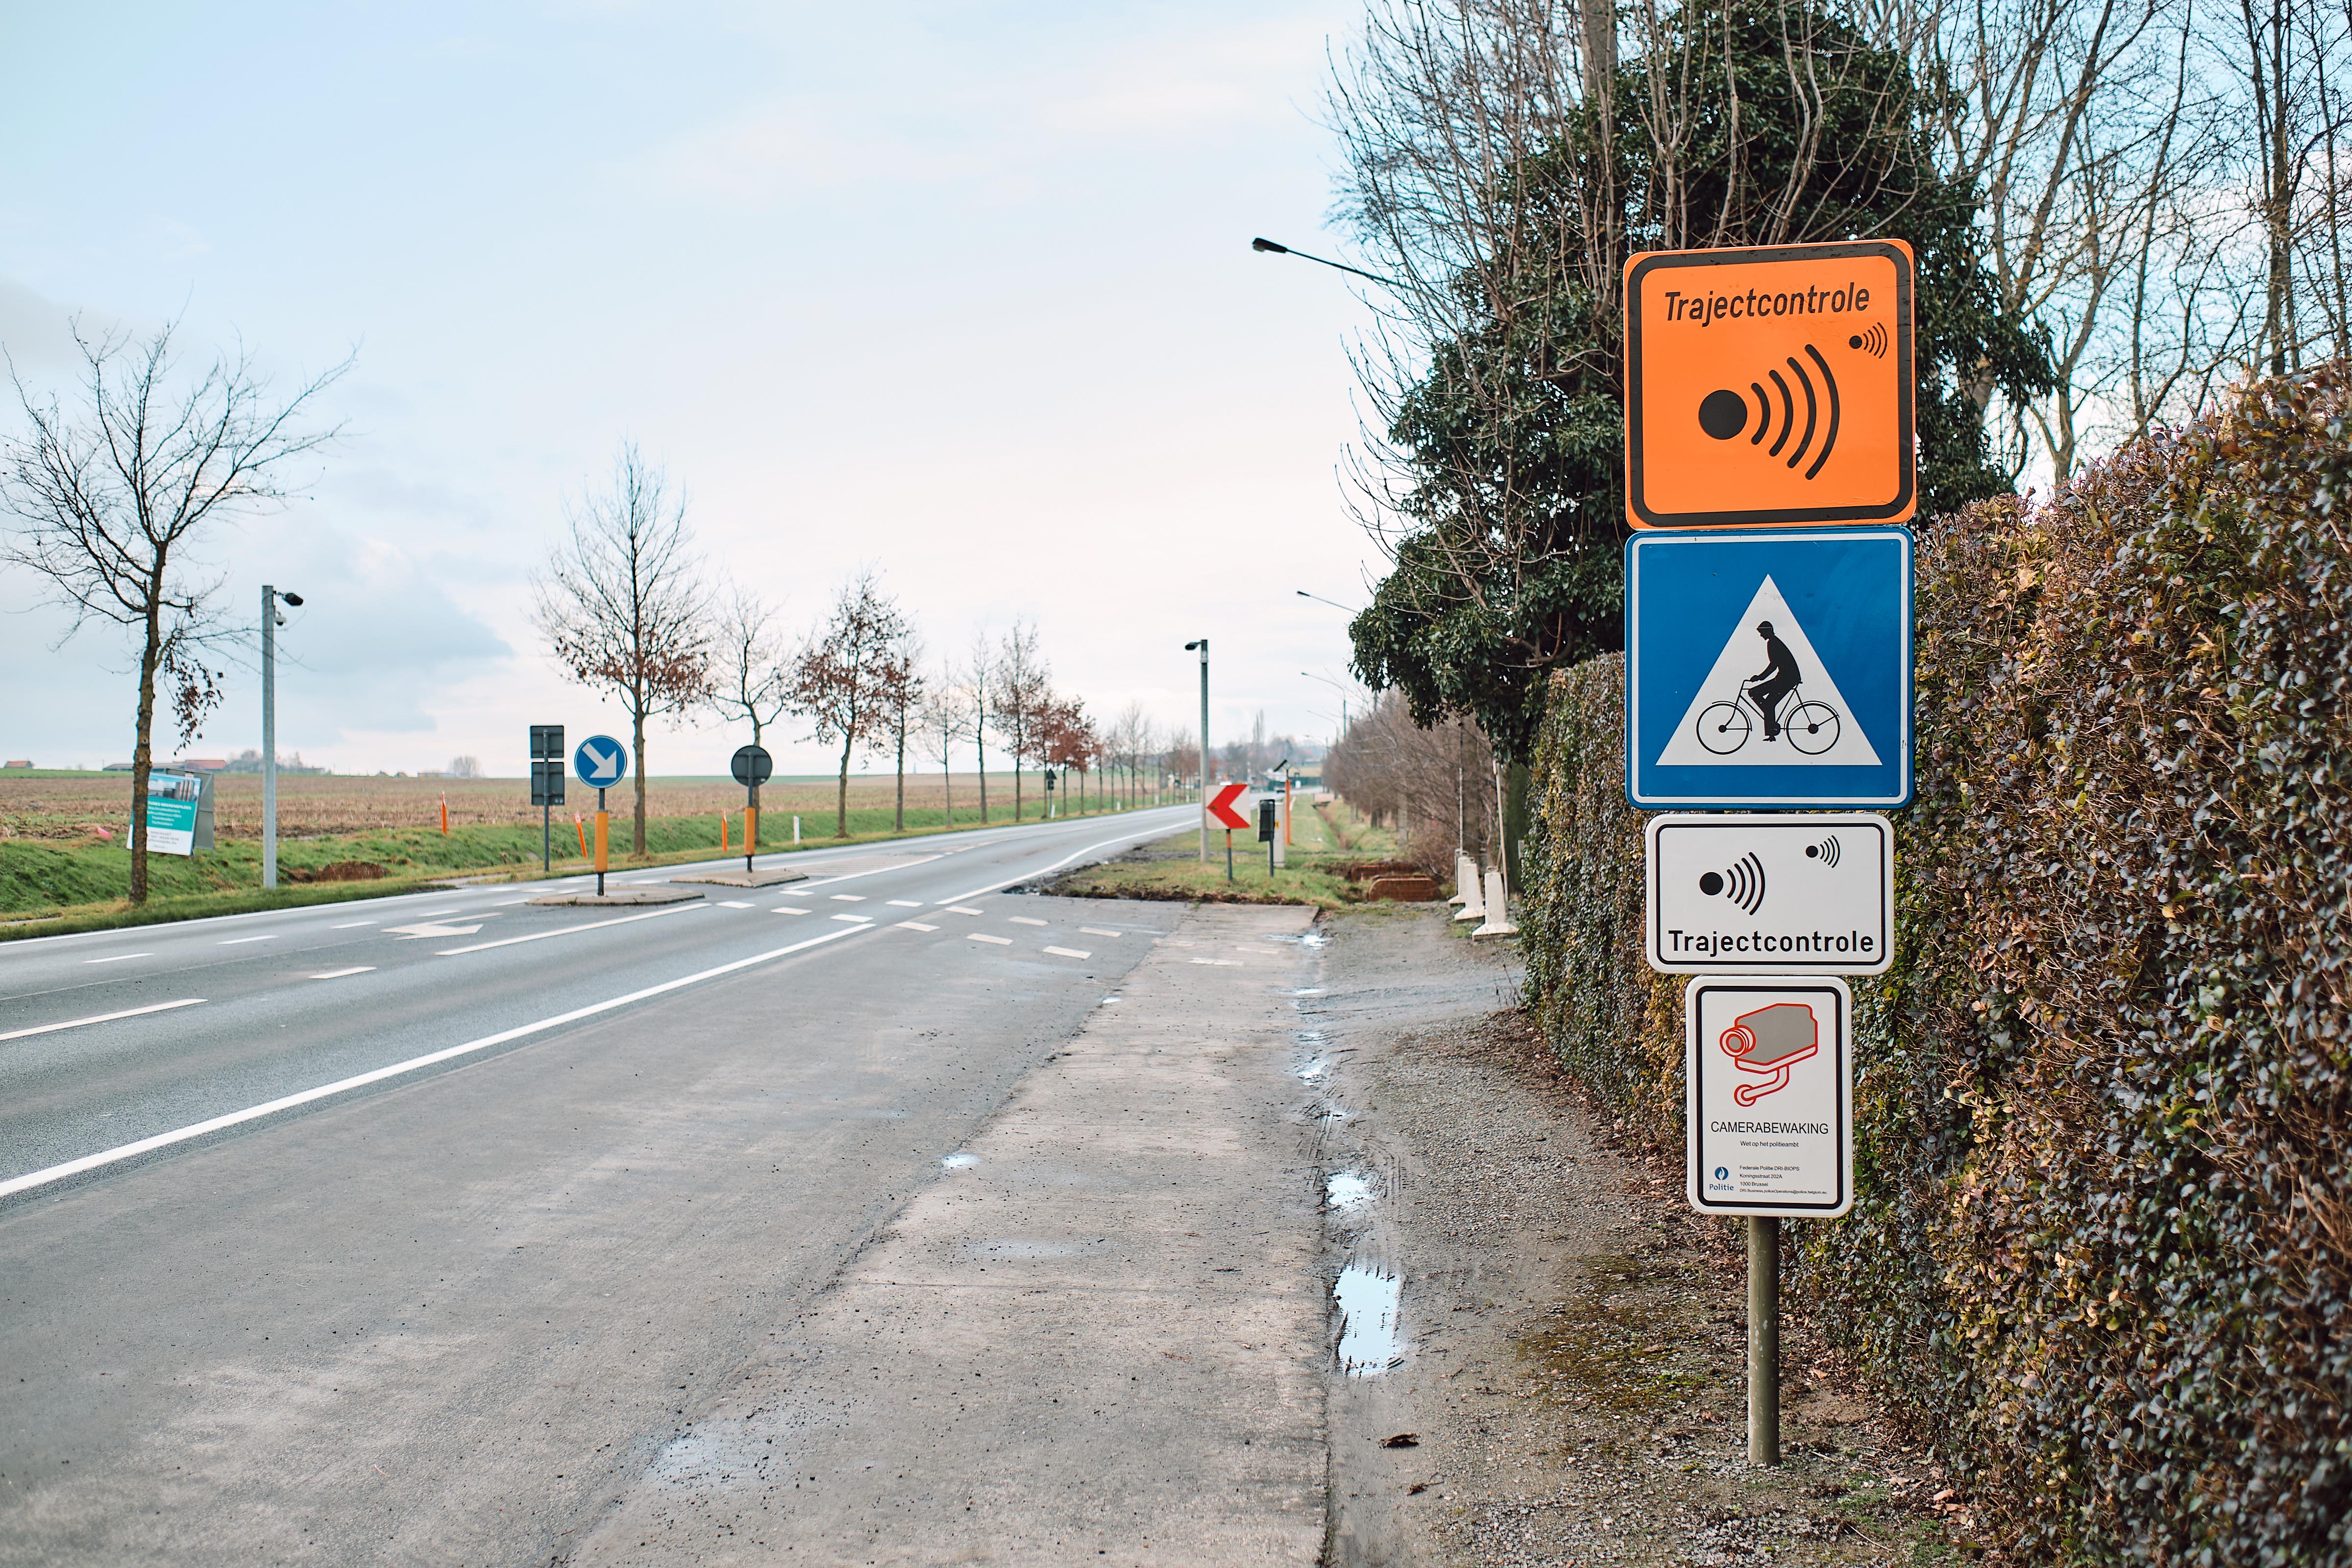 Trajectcontrole N50 Doornikserijksweg Bellegem (copyright: Kortrijk)